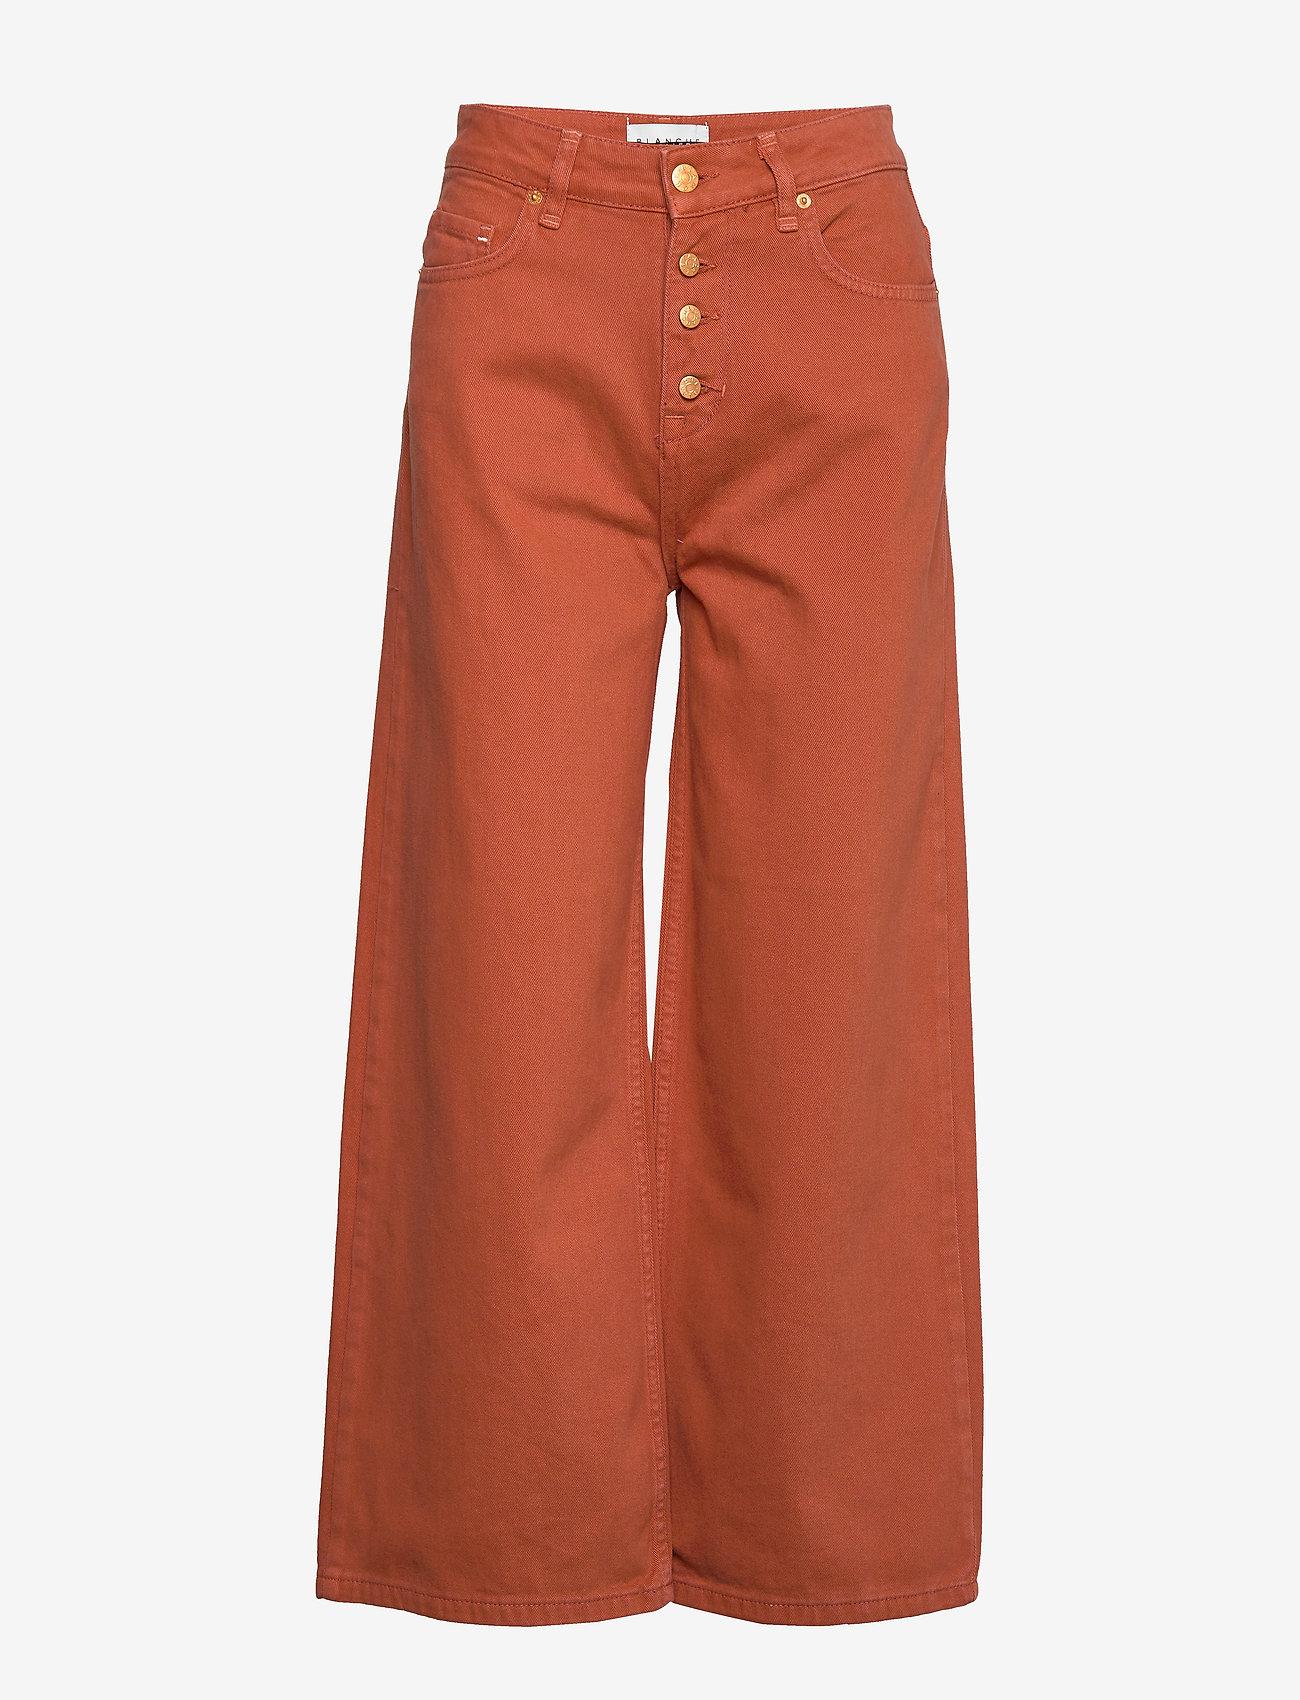 Alia Clean Pants (Spice) - Blanche 1I6KAA